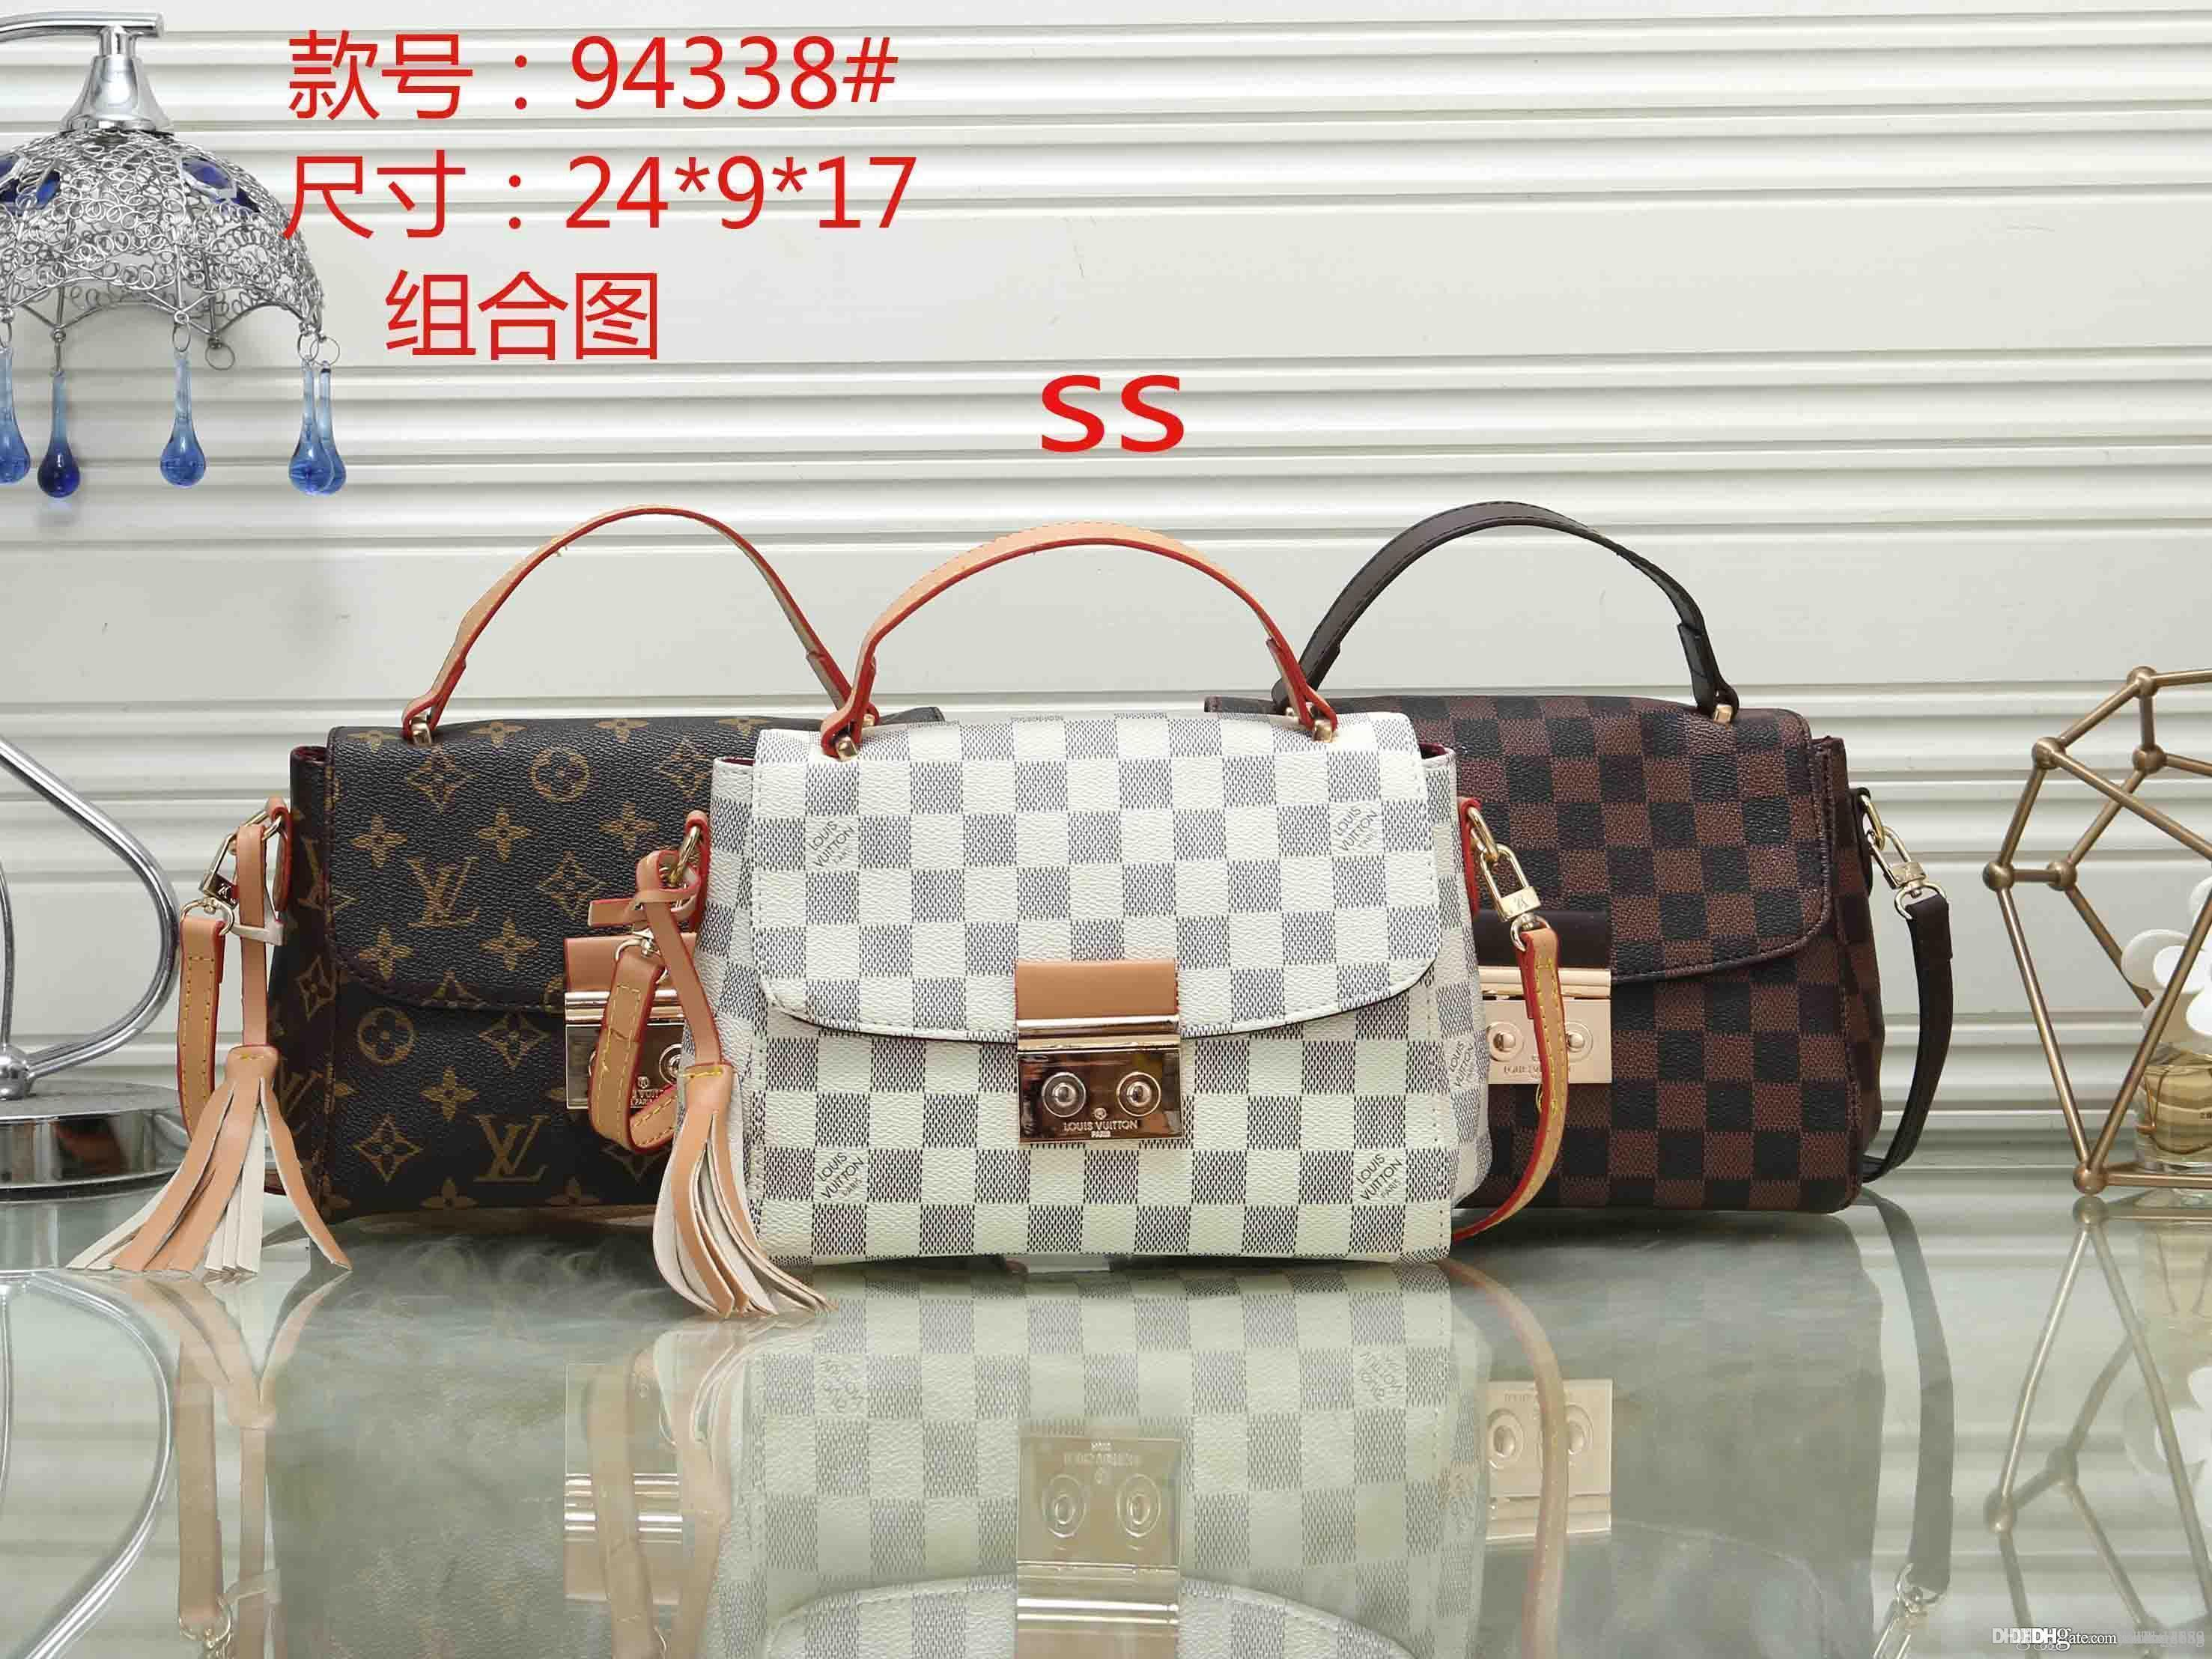 f272e788c2 2019 MK 94338  SS NEW Styles Fashion Bags Ladies Handbags Designer Bags  Women Tote Bag Luxury Brands Bags Single Shoulder Bag From A1handbag